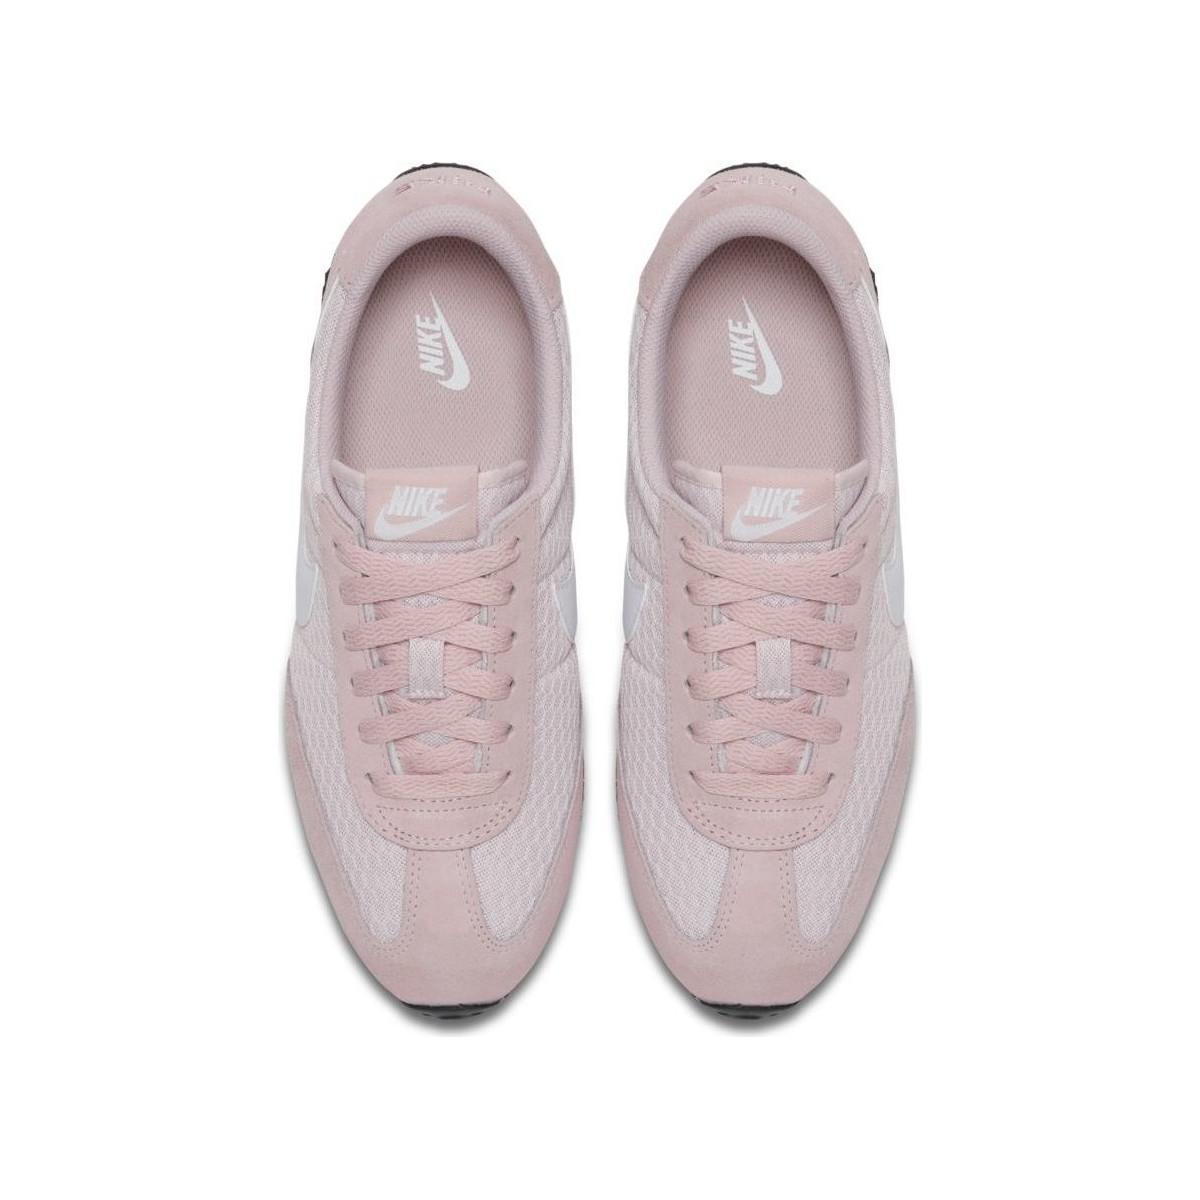 Chaussures Shoe En Rose Nike Textile Women's Oceania 511880 Femmes jLMVqzpGUS